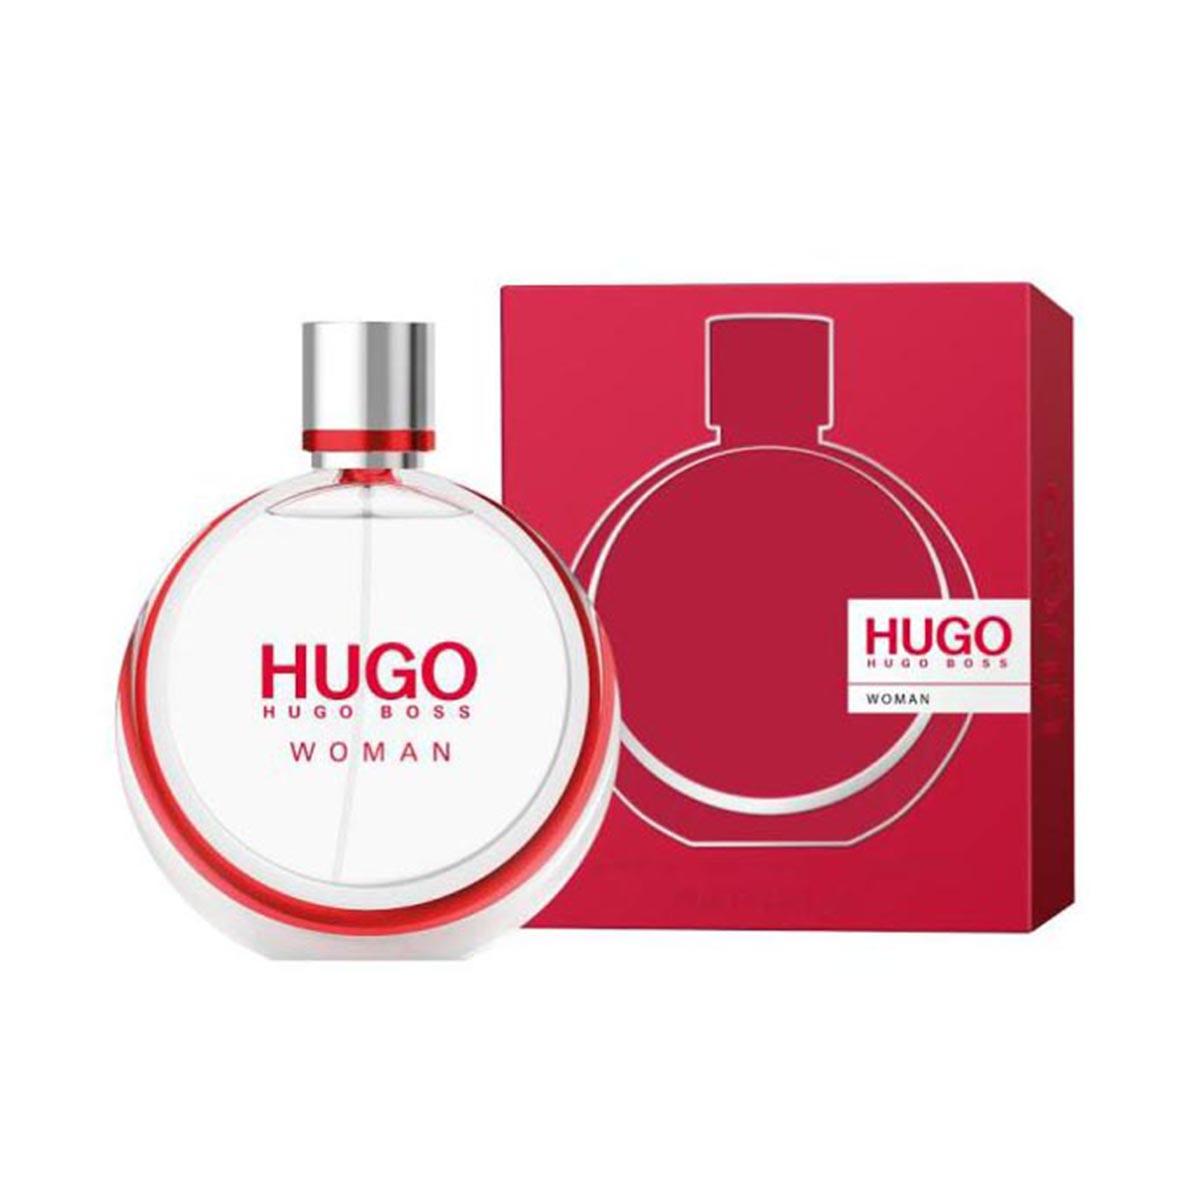 Hugo boss woman eau de parfum 75ml vaporizador